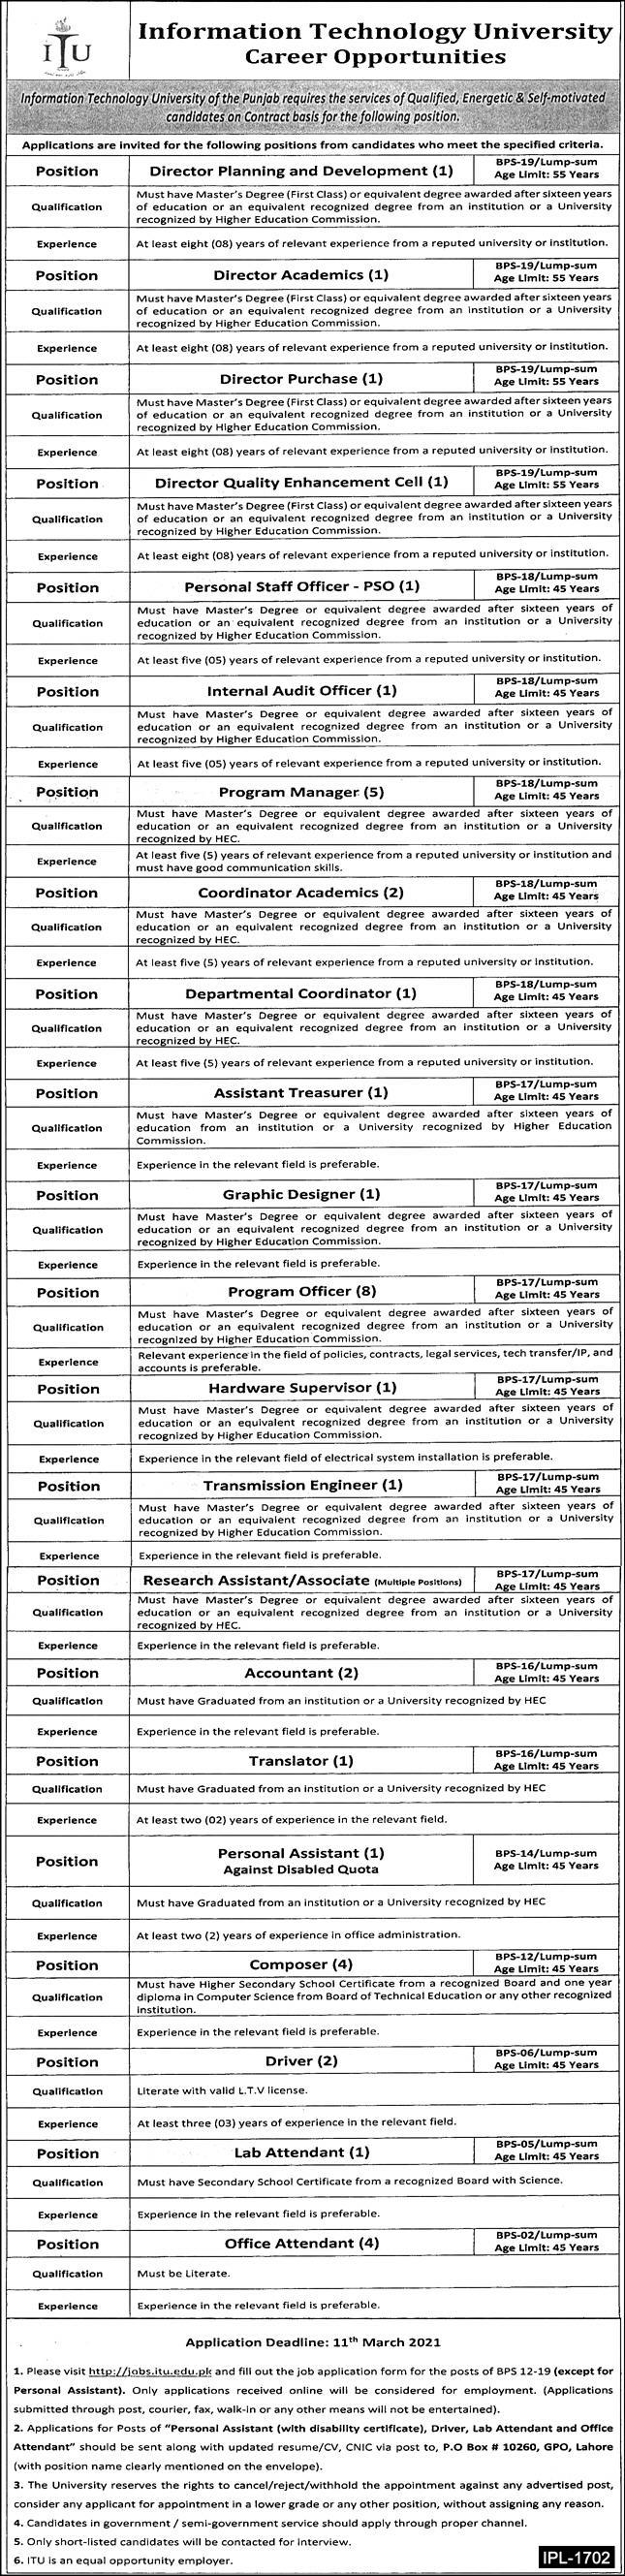 Information Technology University ITU Jobs 2021 For Non Teaching Staff